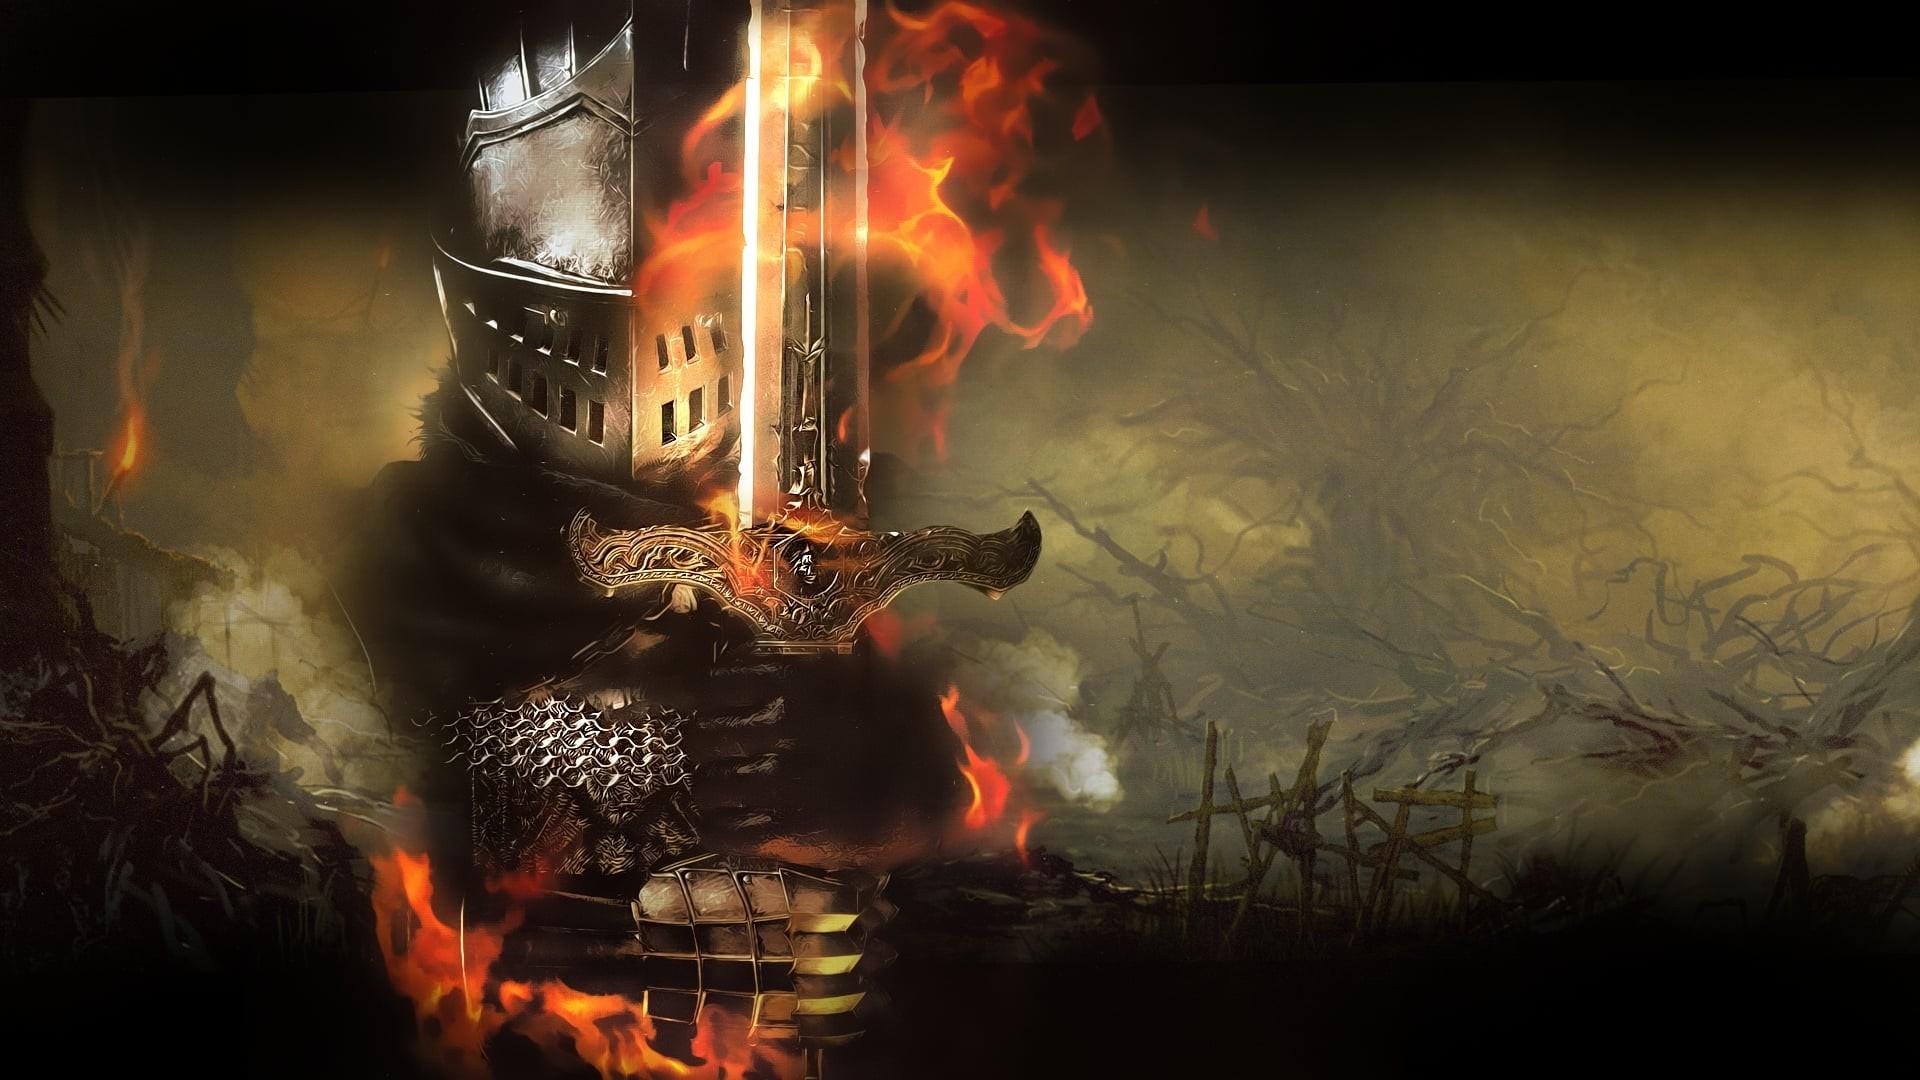 Knight Artorias – Dark Souls HD Formidable Wallpaper Free   Adorable  Wallpapers   Pinterest   Dark souls, Knight and Wallpaper